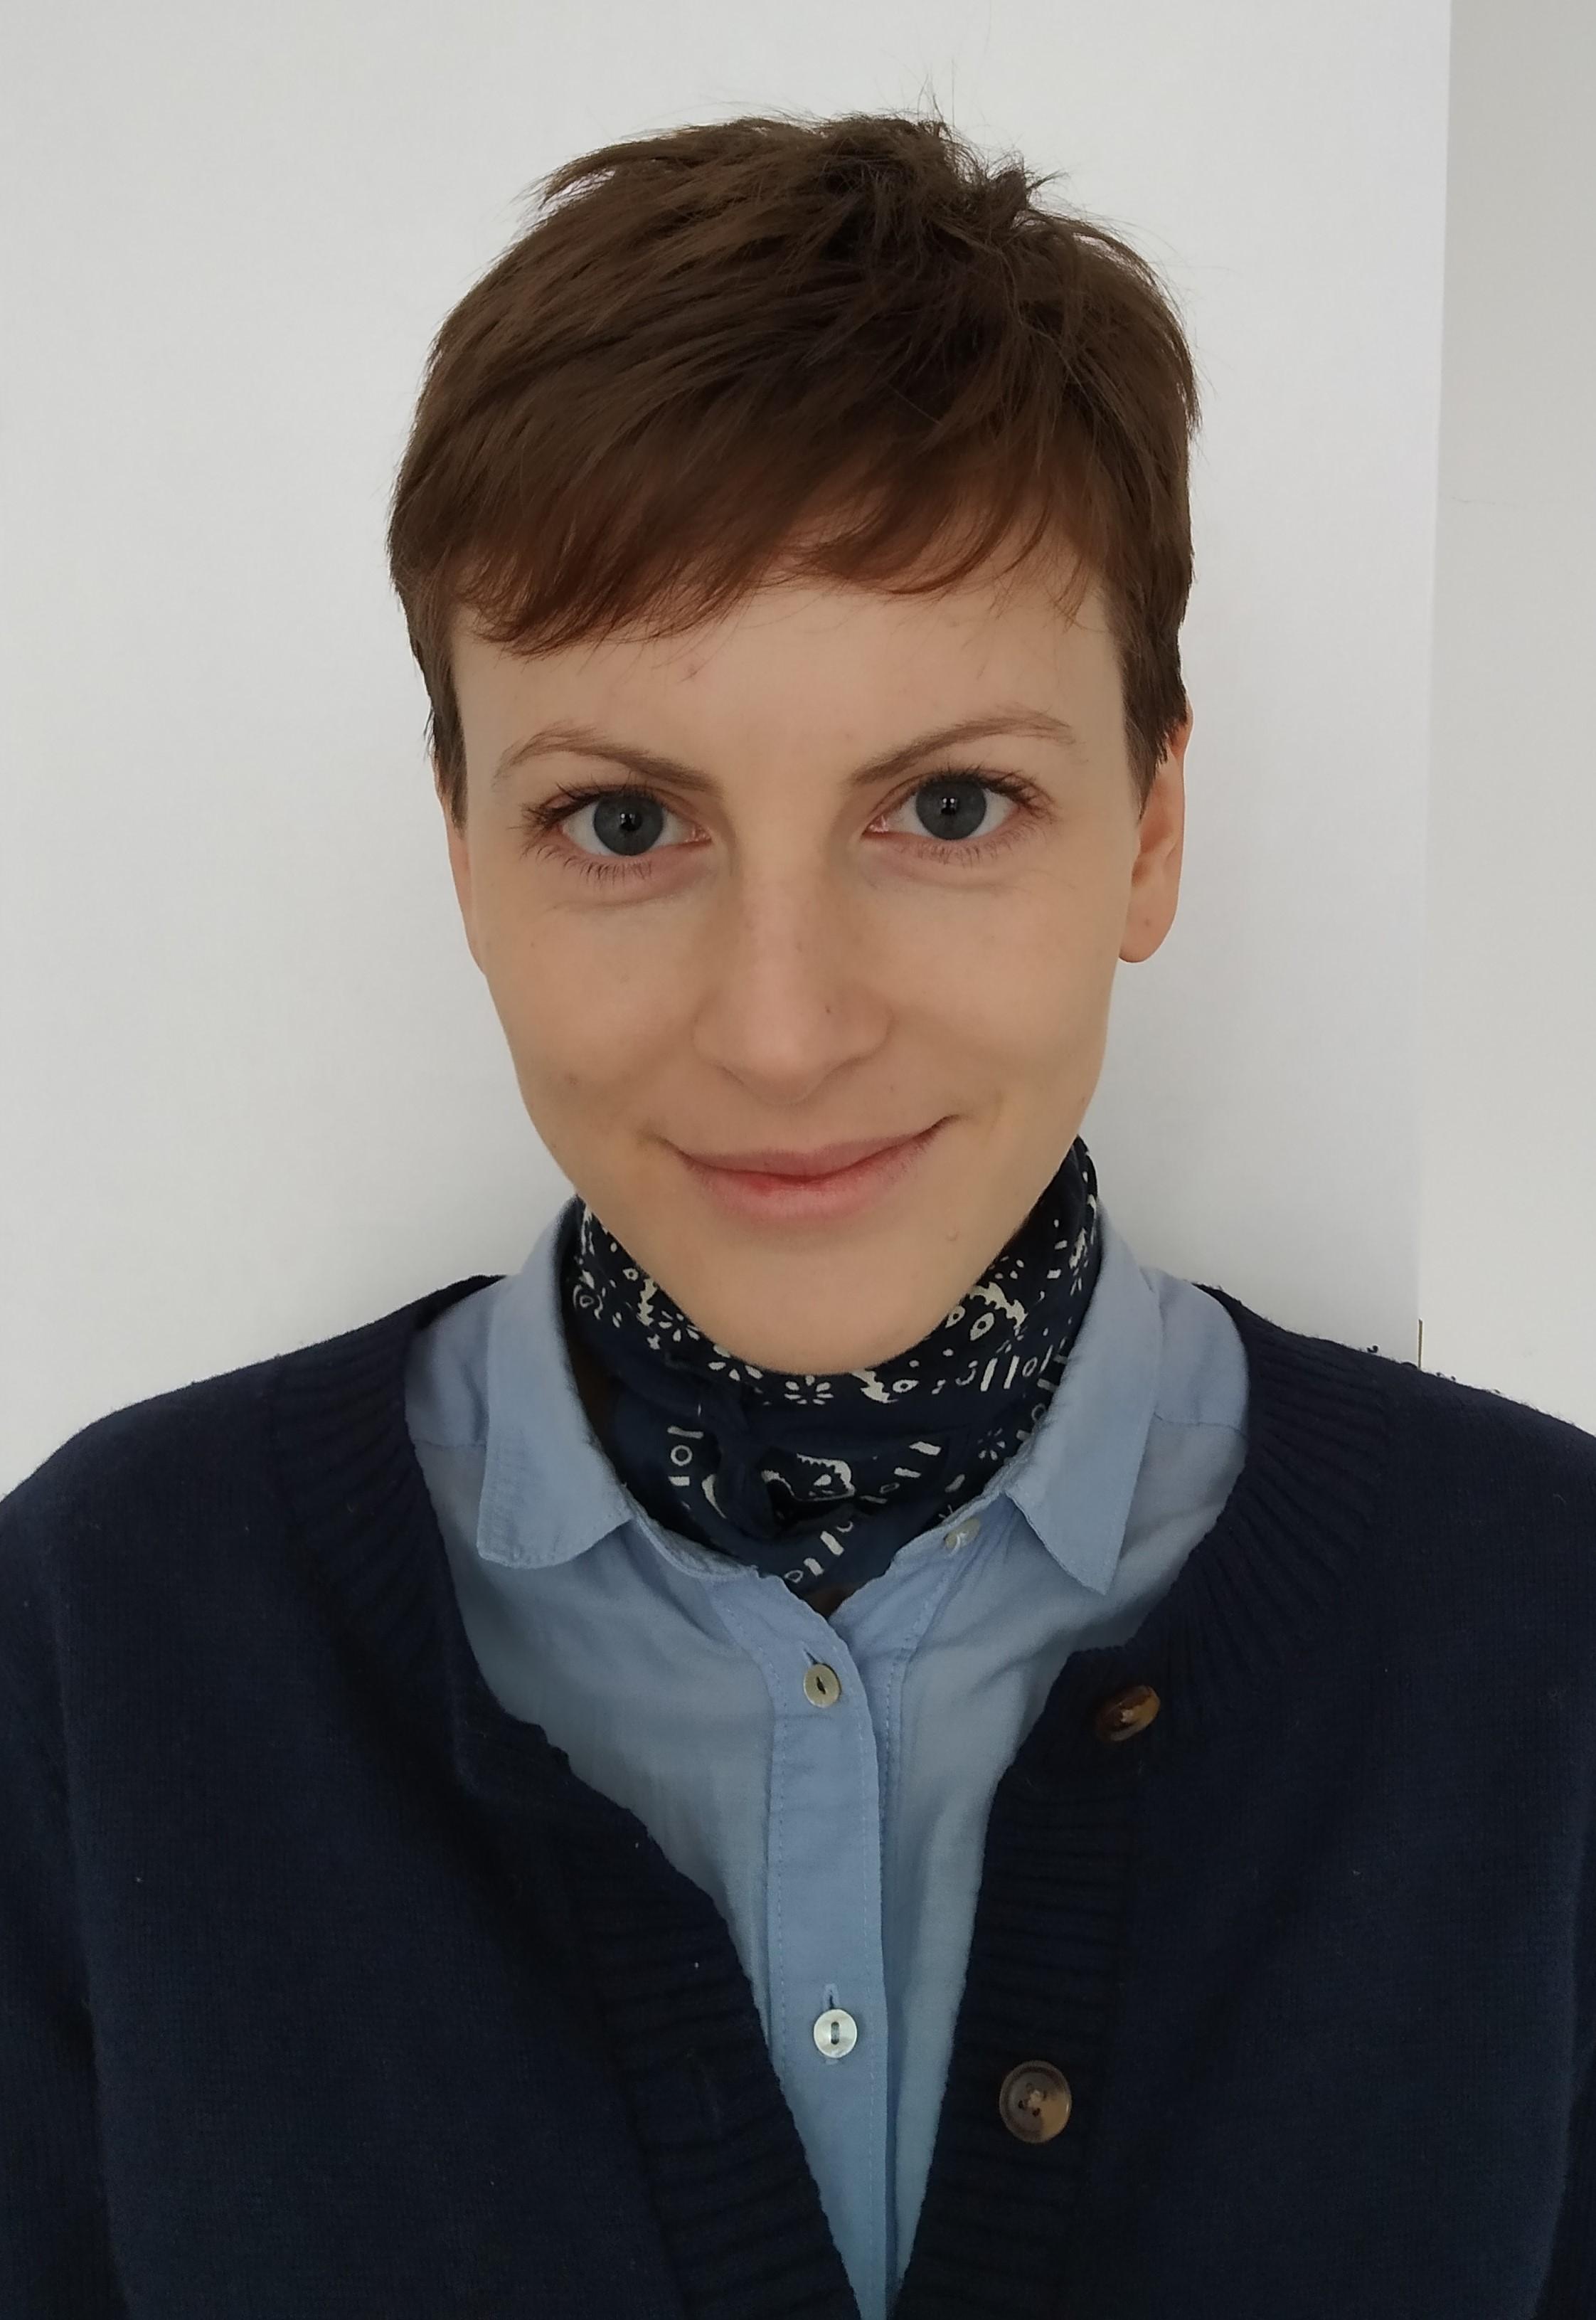 Mia Skjold Tvede Henriksen